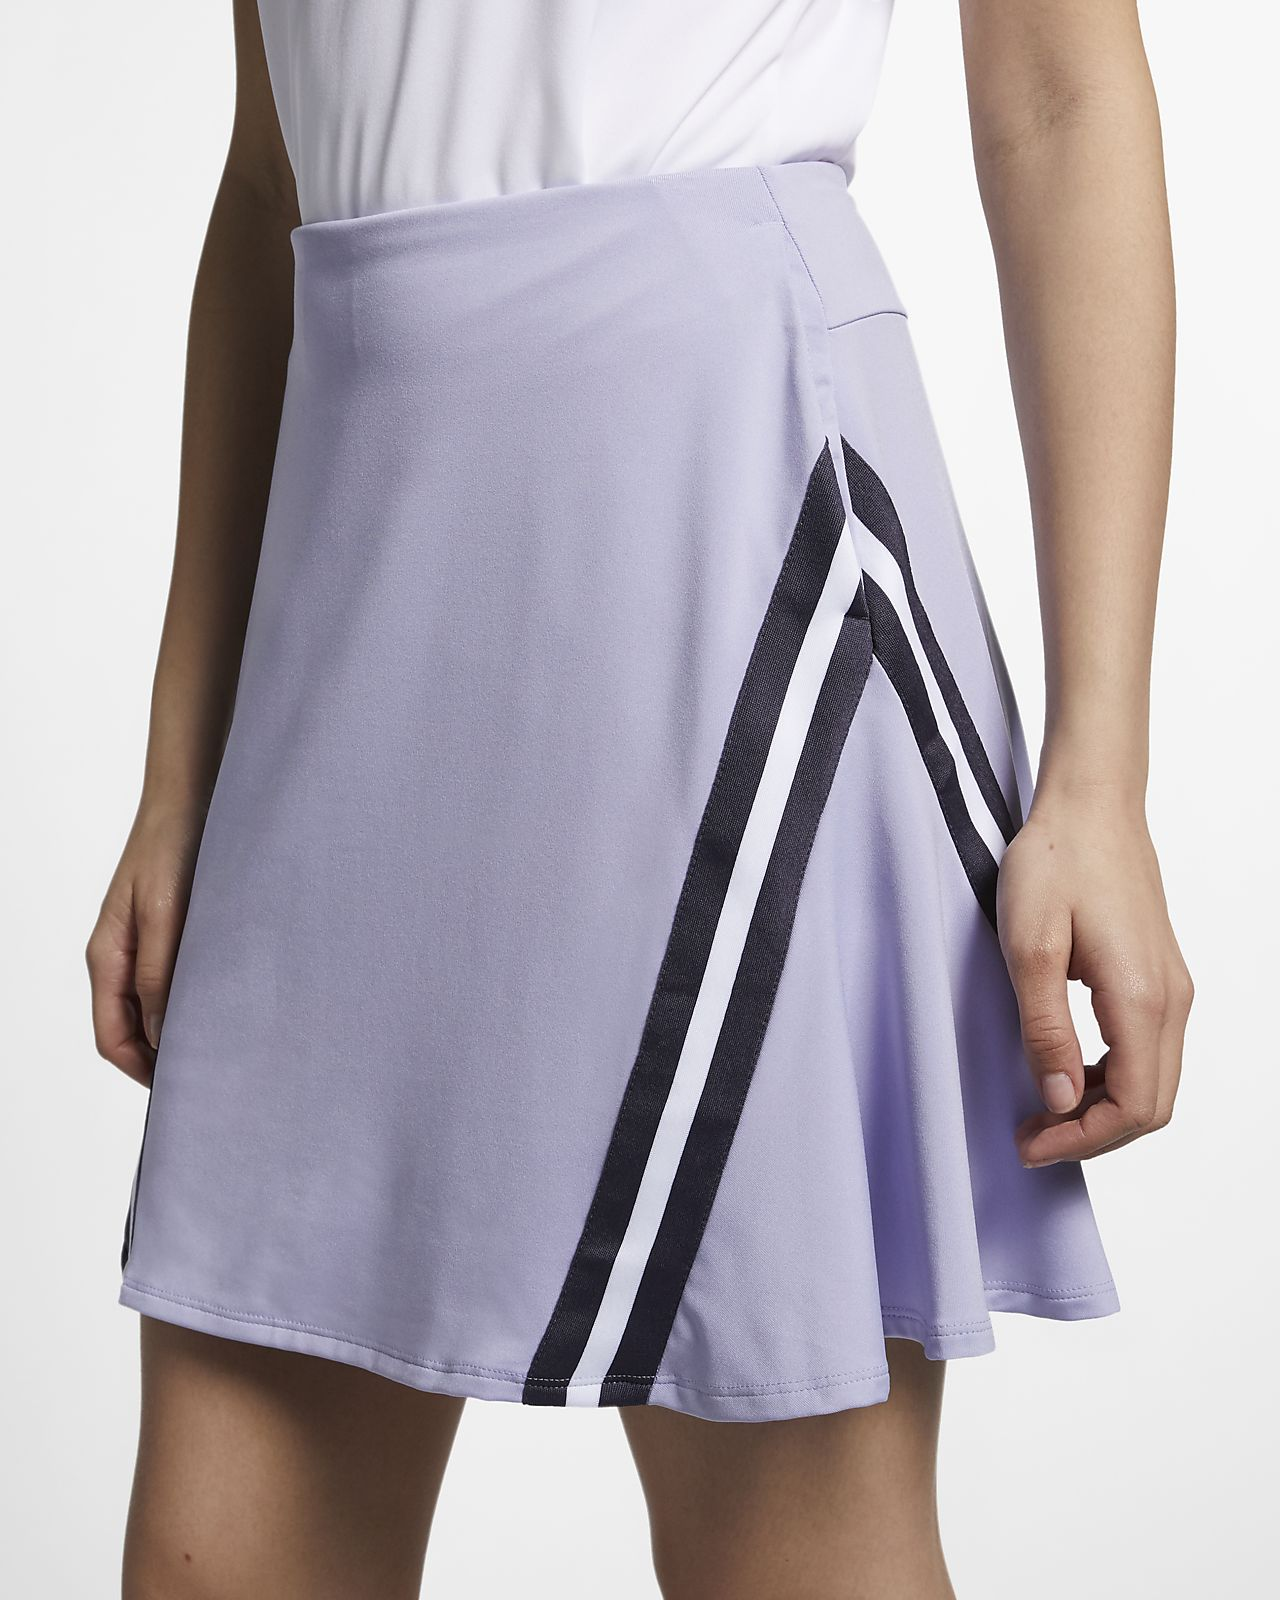 Юбка для гольфа Nike Dri-FIT UV 43 см